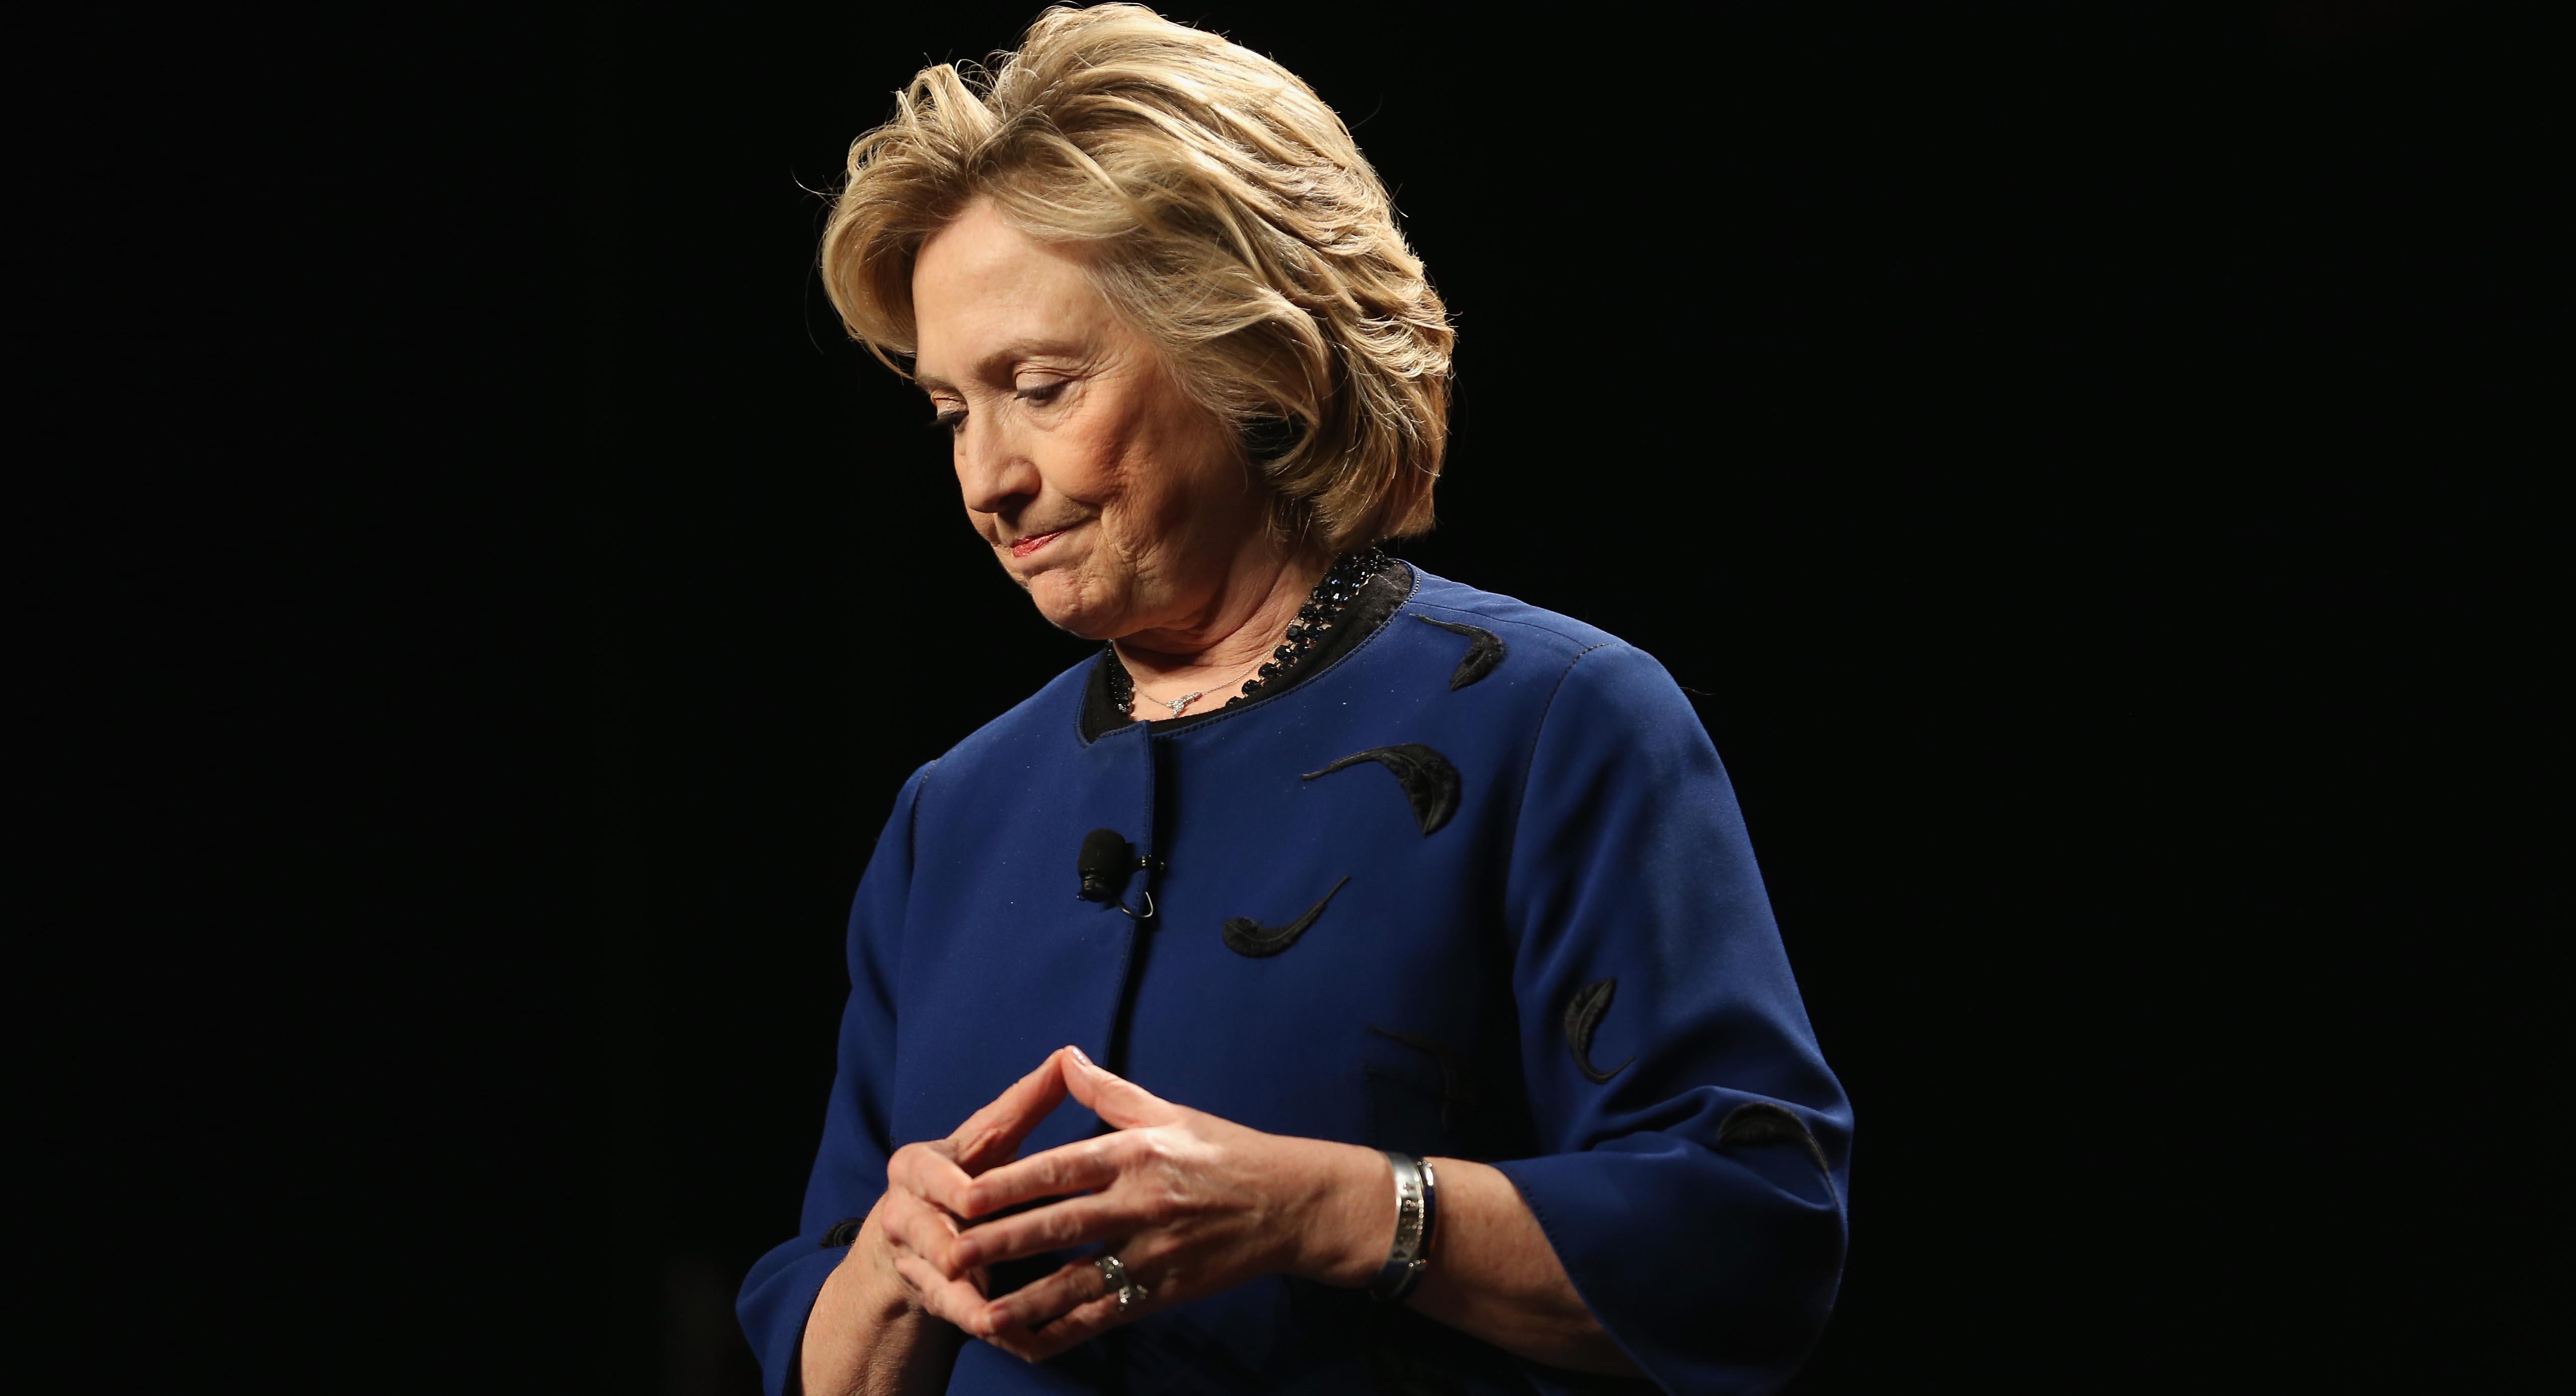 Hillary Clinton Speaks At The University Of Miami